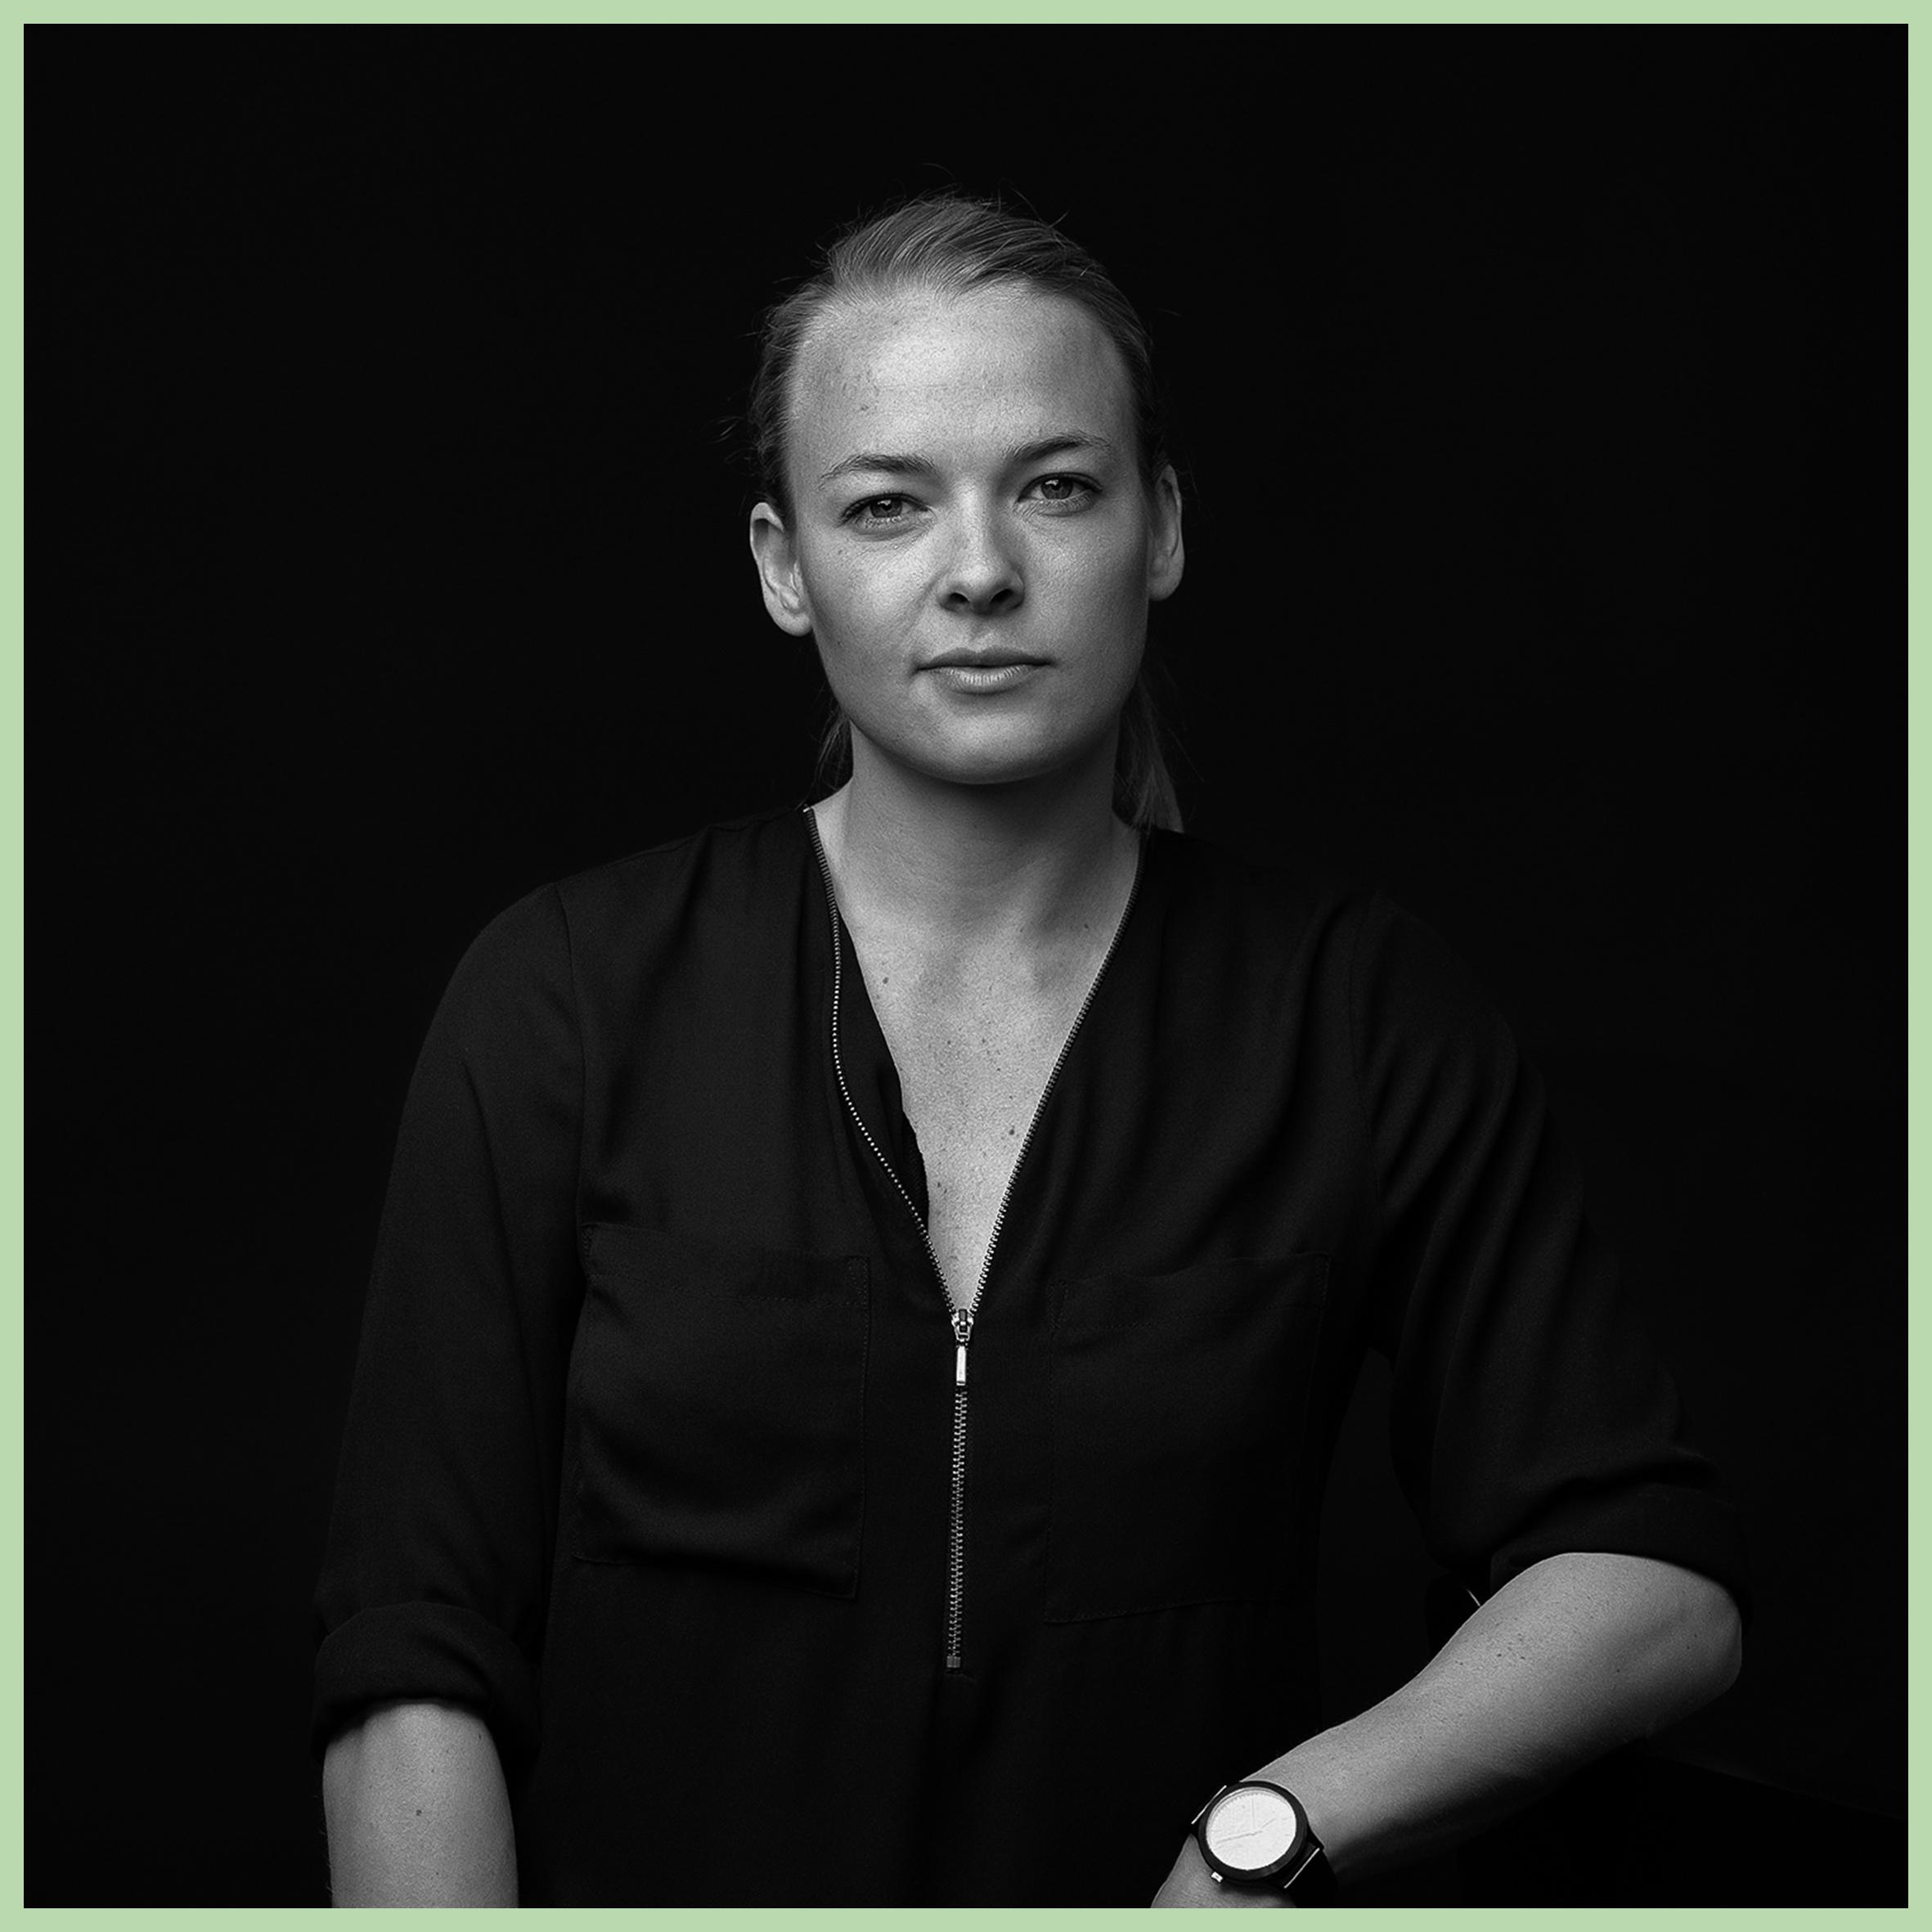 Sanna Westman - Investment Manager at Creandum